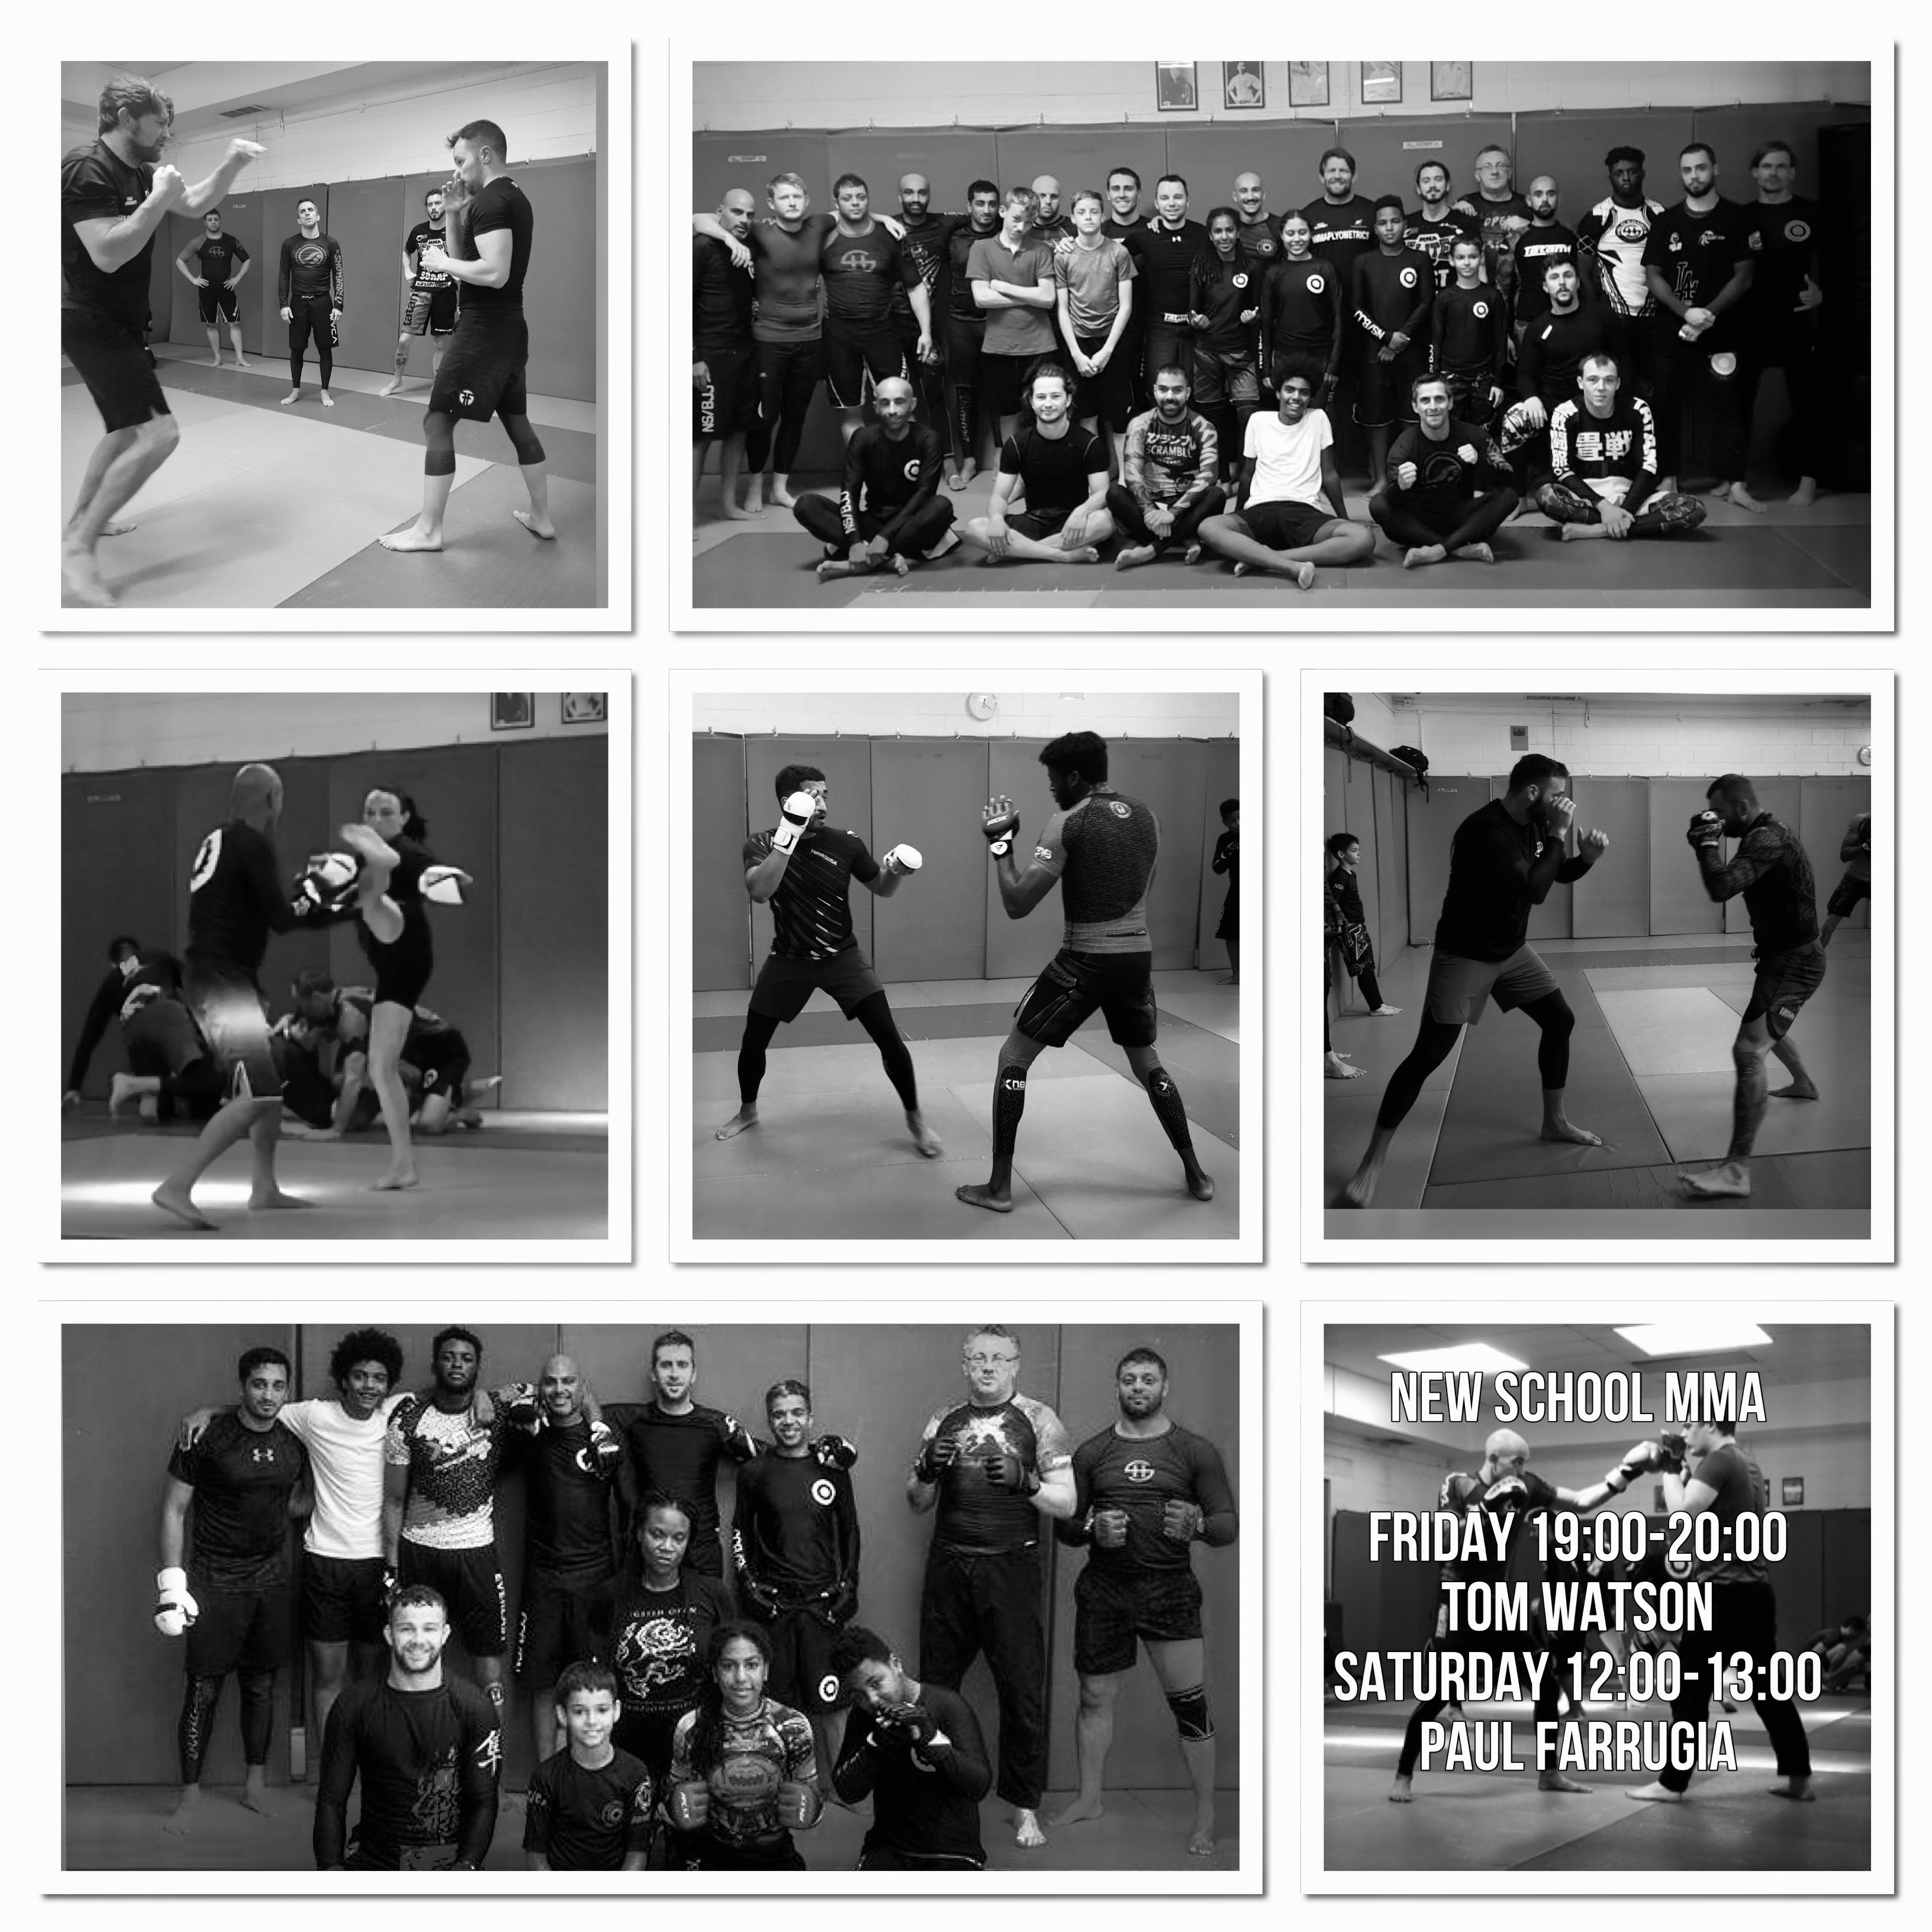 New School MMA – Class Act